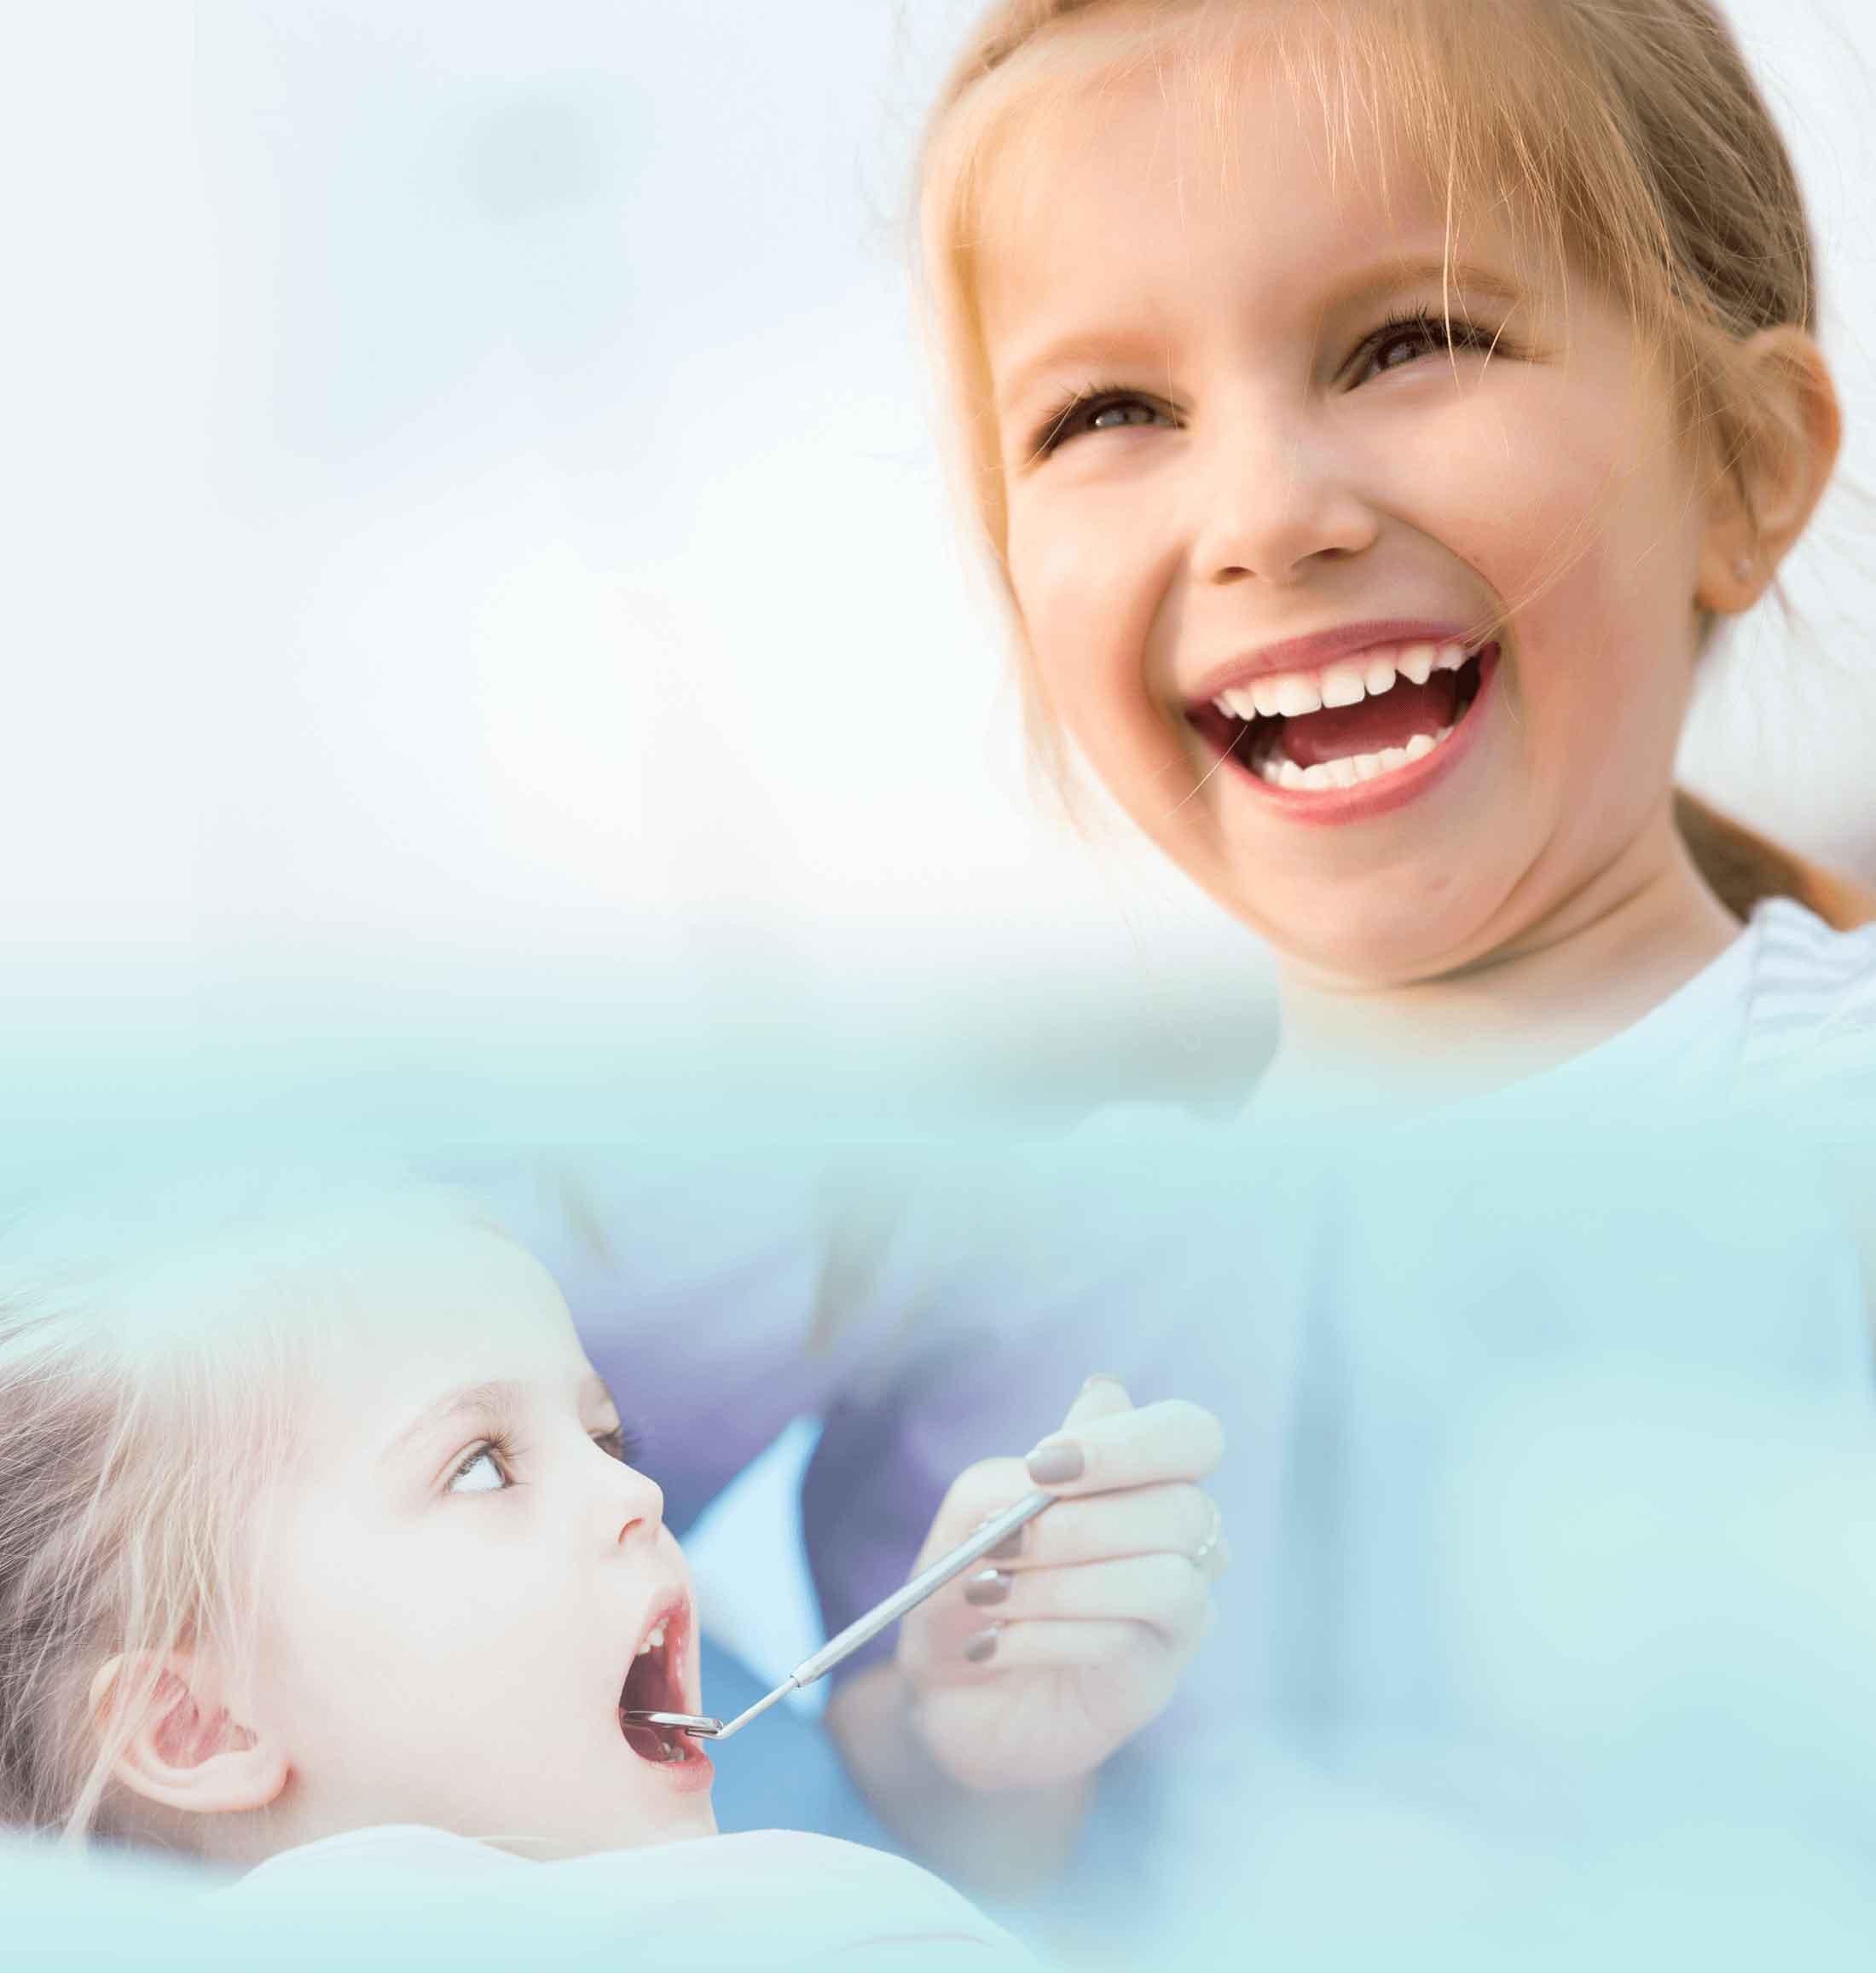 Dental Exam Background